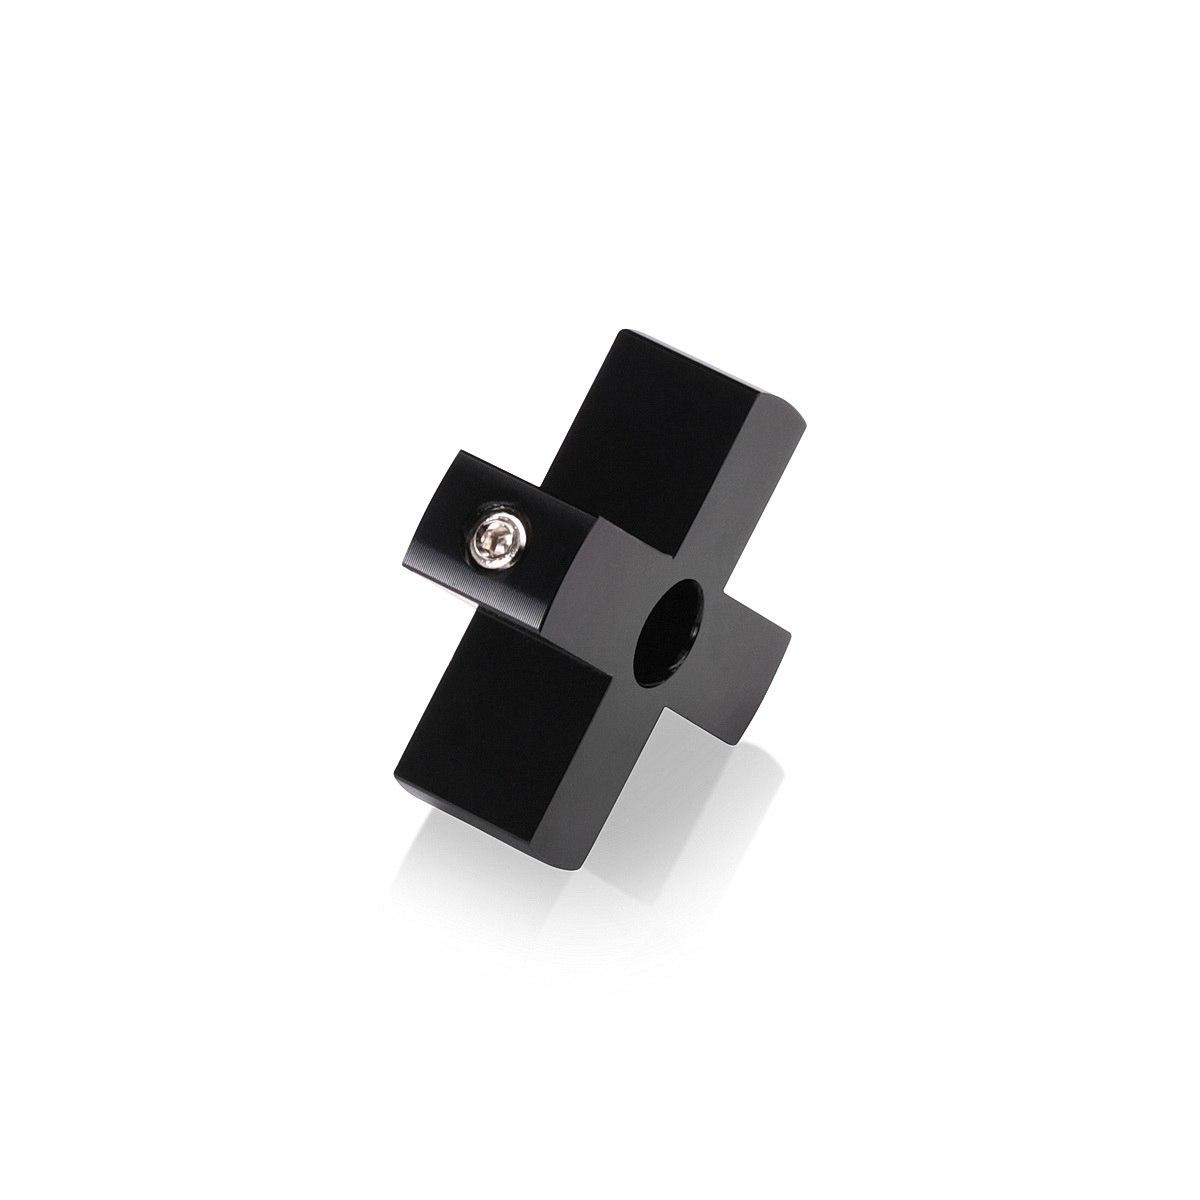 4-Way Standoffs Hub, Diameter: 1 1/2'', Thickness: 1/2'', Black Anodized Aluminum